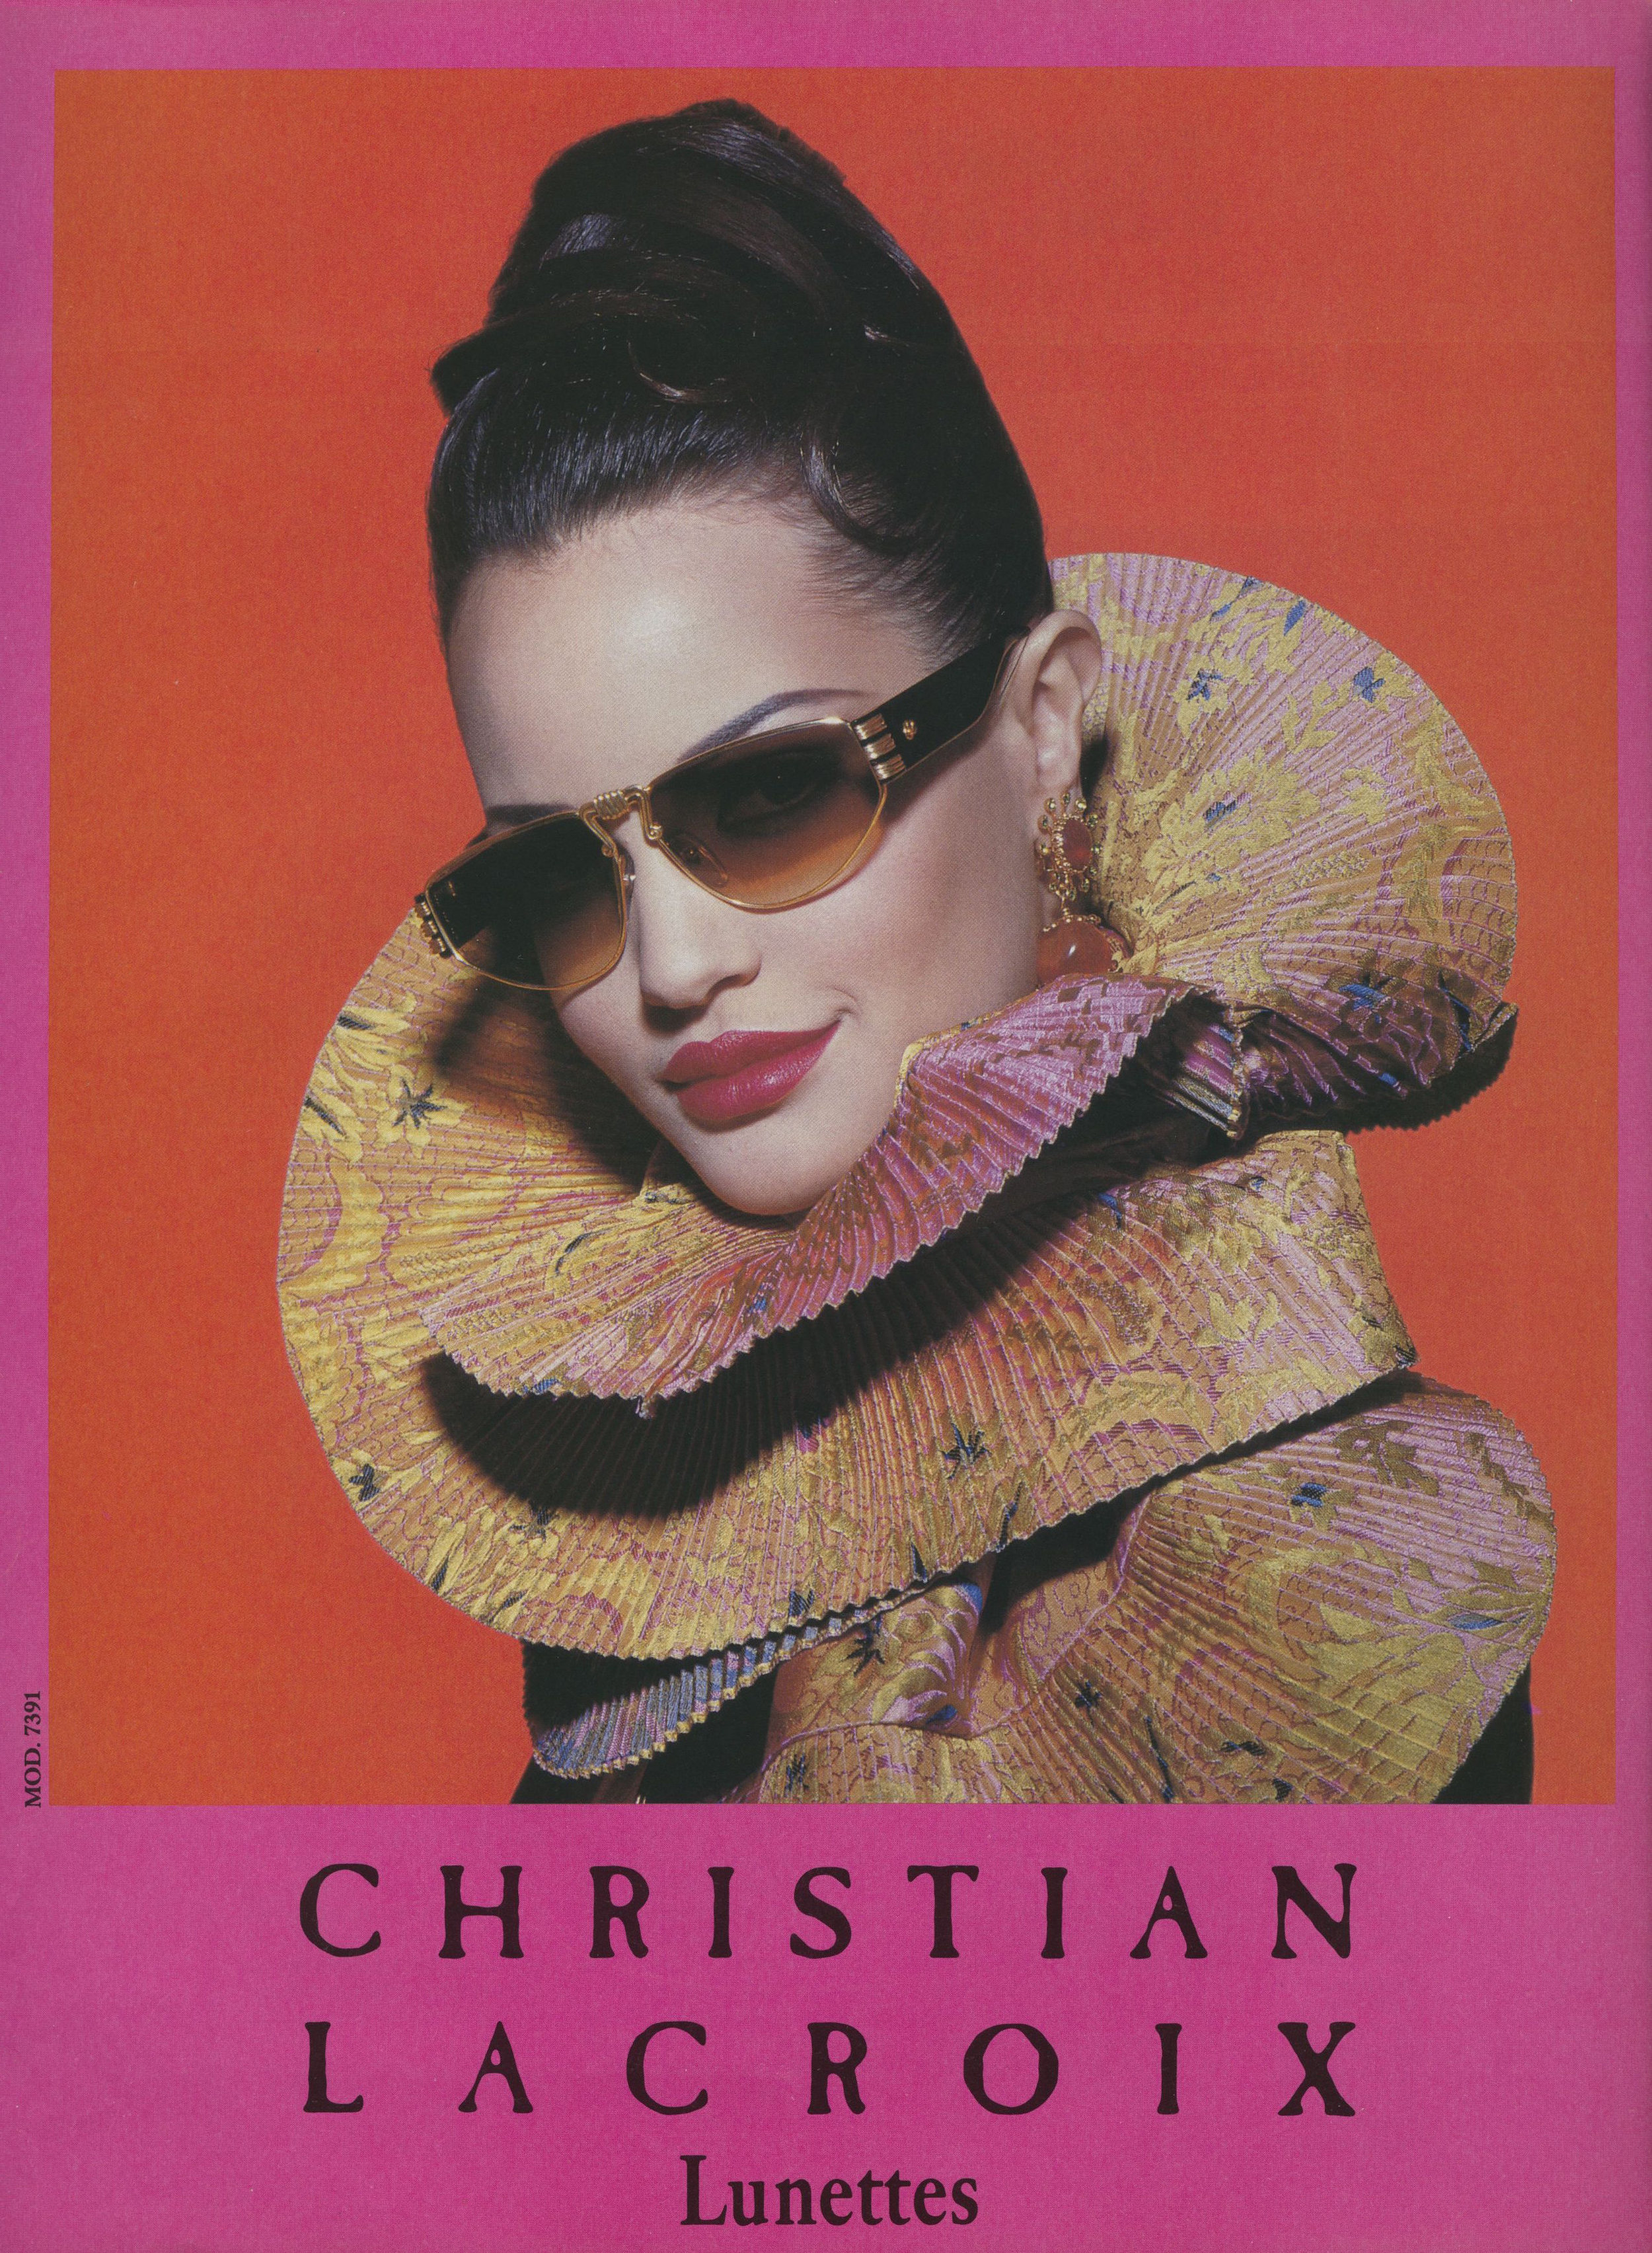 Christian Lacroix Campaign, Tyen